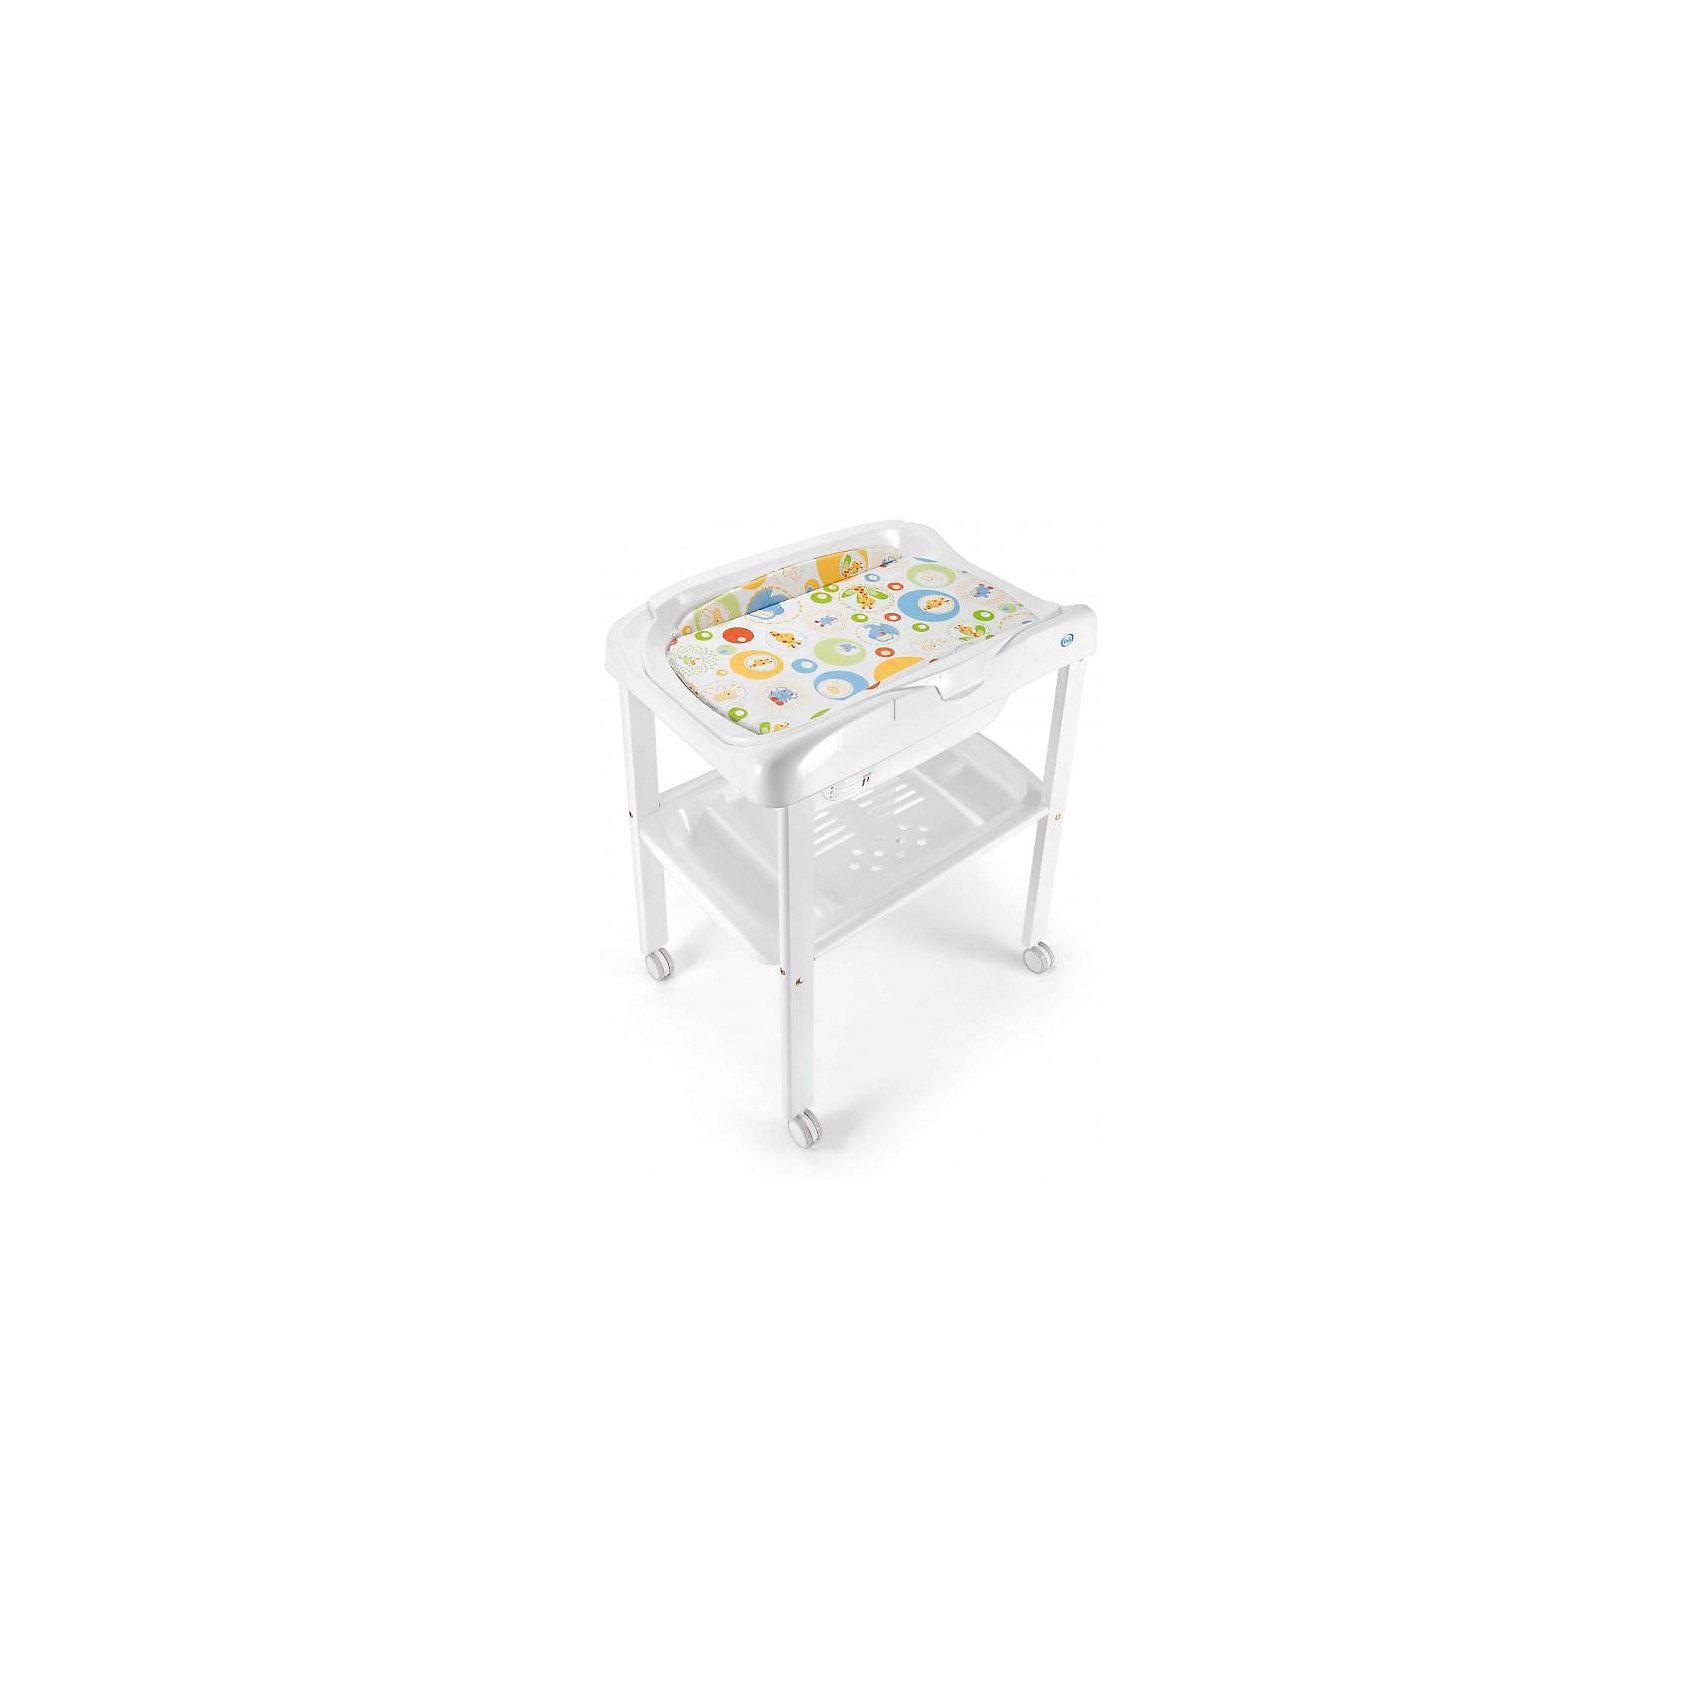 Пеленальный столик GigiLele, Pali, белый/мандарин